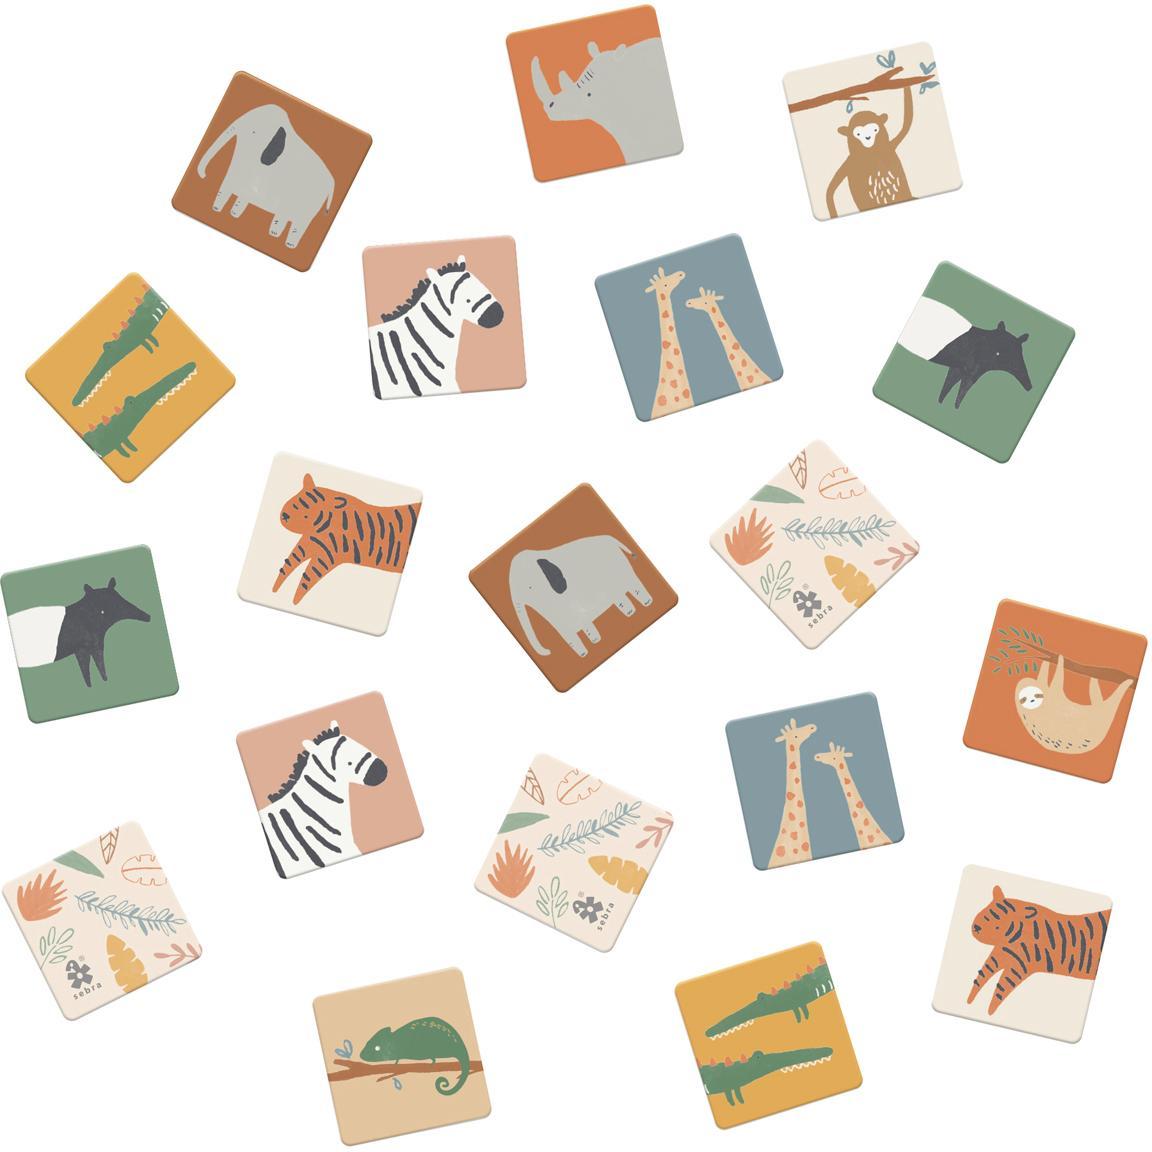 Memory Wildlife, 30 pz., Cartone solido, Multicolore, Larg. 6 x Lung. 6 cm